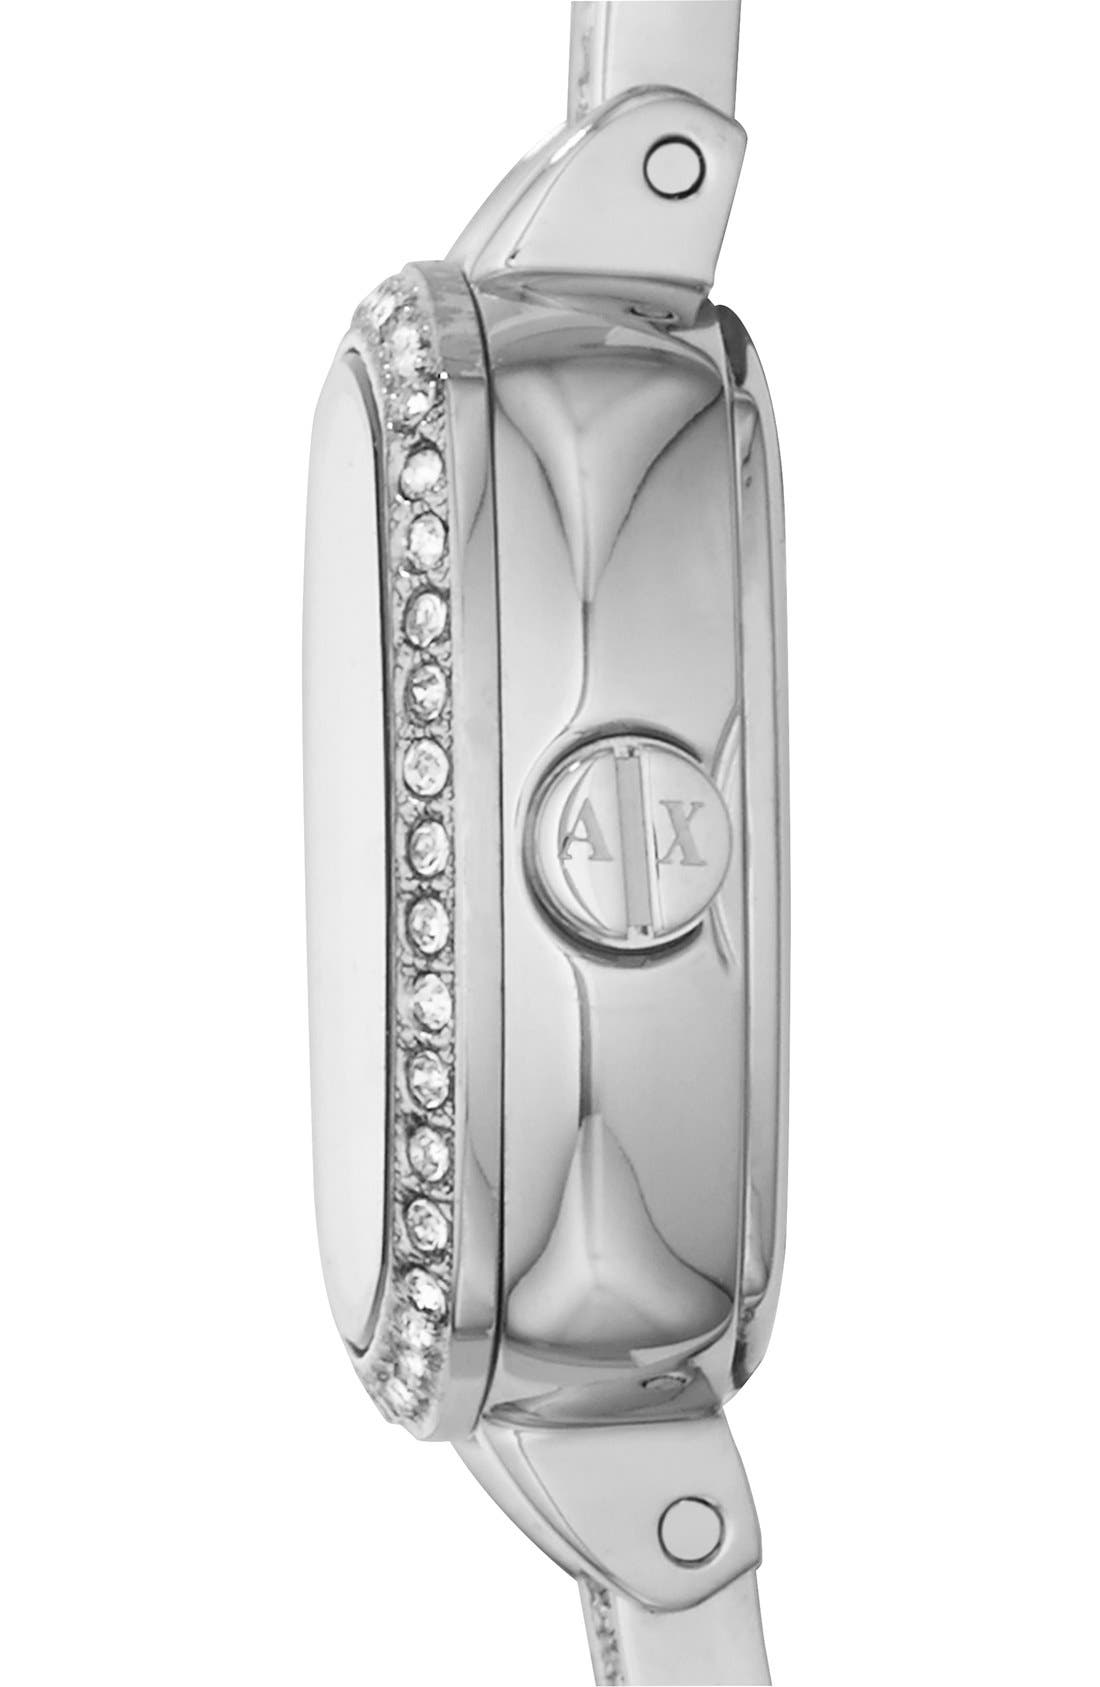 Alternate Image 3  - AX Armani Exchange Crystal Encrusted Bangle Watch, 22mm